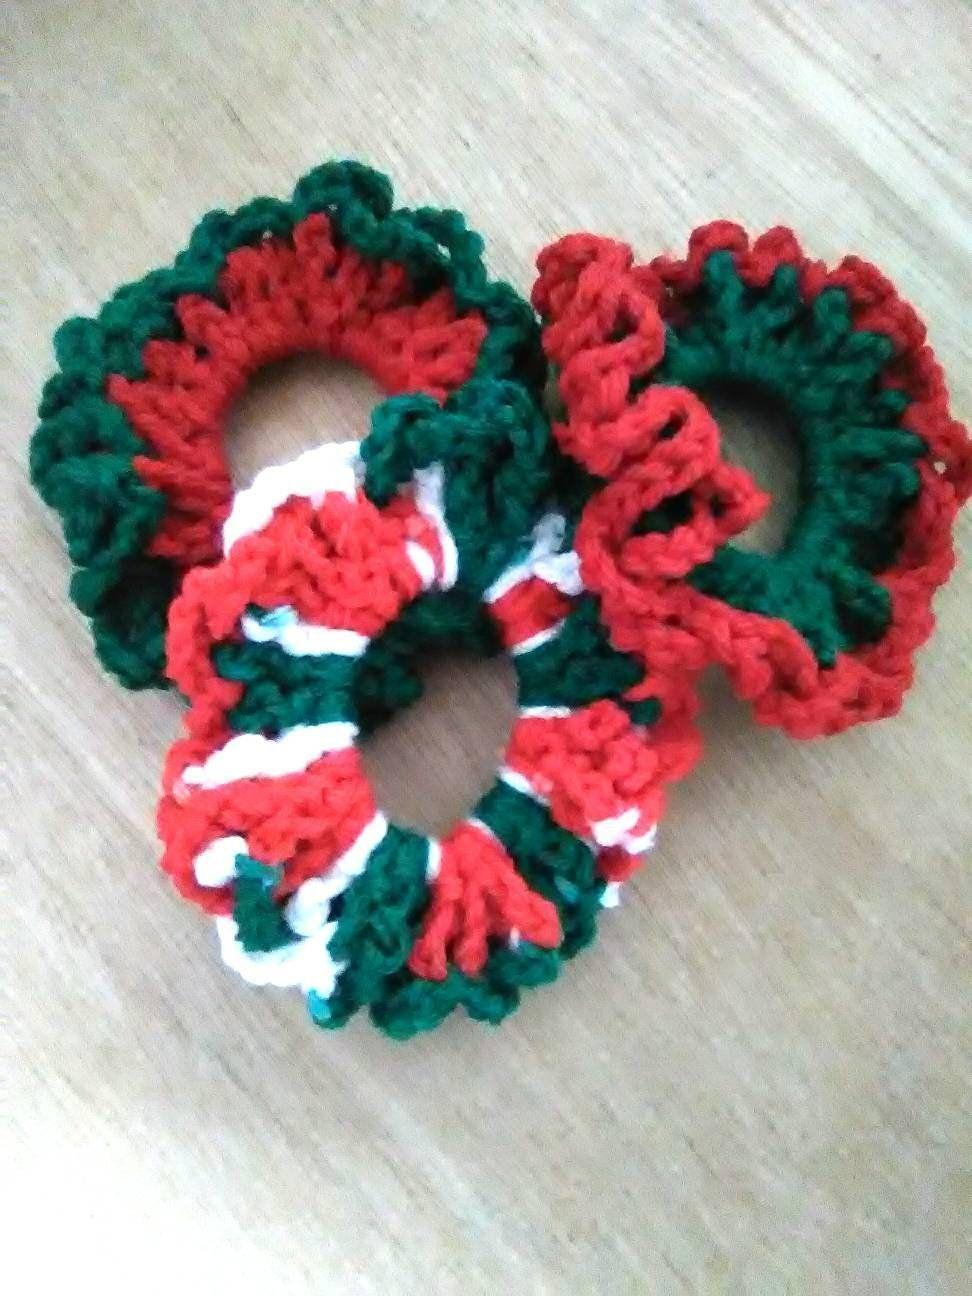 Crochet scrunchies, Christmas scrunchies, Christmas hair ties, pony tail holders, hair accessories, #crochetscrunchies Crochet scrunchies, Christmas scrunchies, Christmas hair ties, pony tail holders, hair accessories, #crochetscrunchies Crochet scrunchies, Christmas scrunchies, Christmas hair ties, pony tail holders, hair accessories, #crochetscrunchies Crochet scrunchies, Christmas scrunchies, Christmas hair ties, pony tail holders, hair accessories, #crochetpony Crochet scrunchies, Christmas #hairaccessories